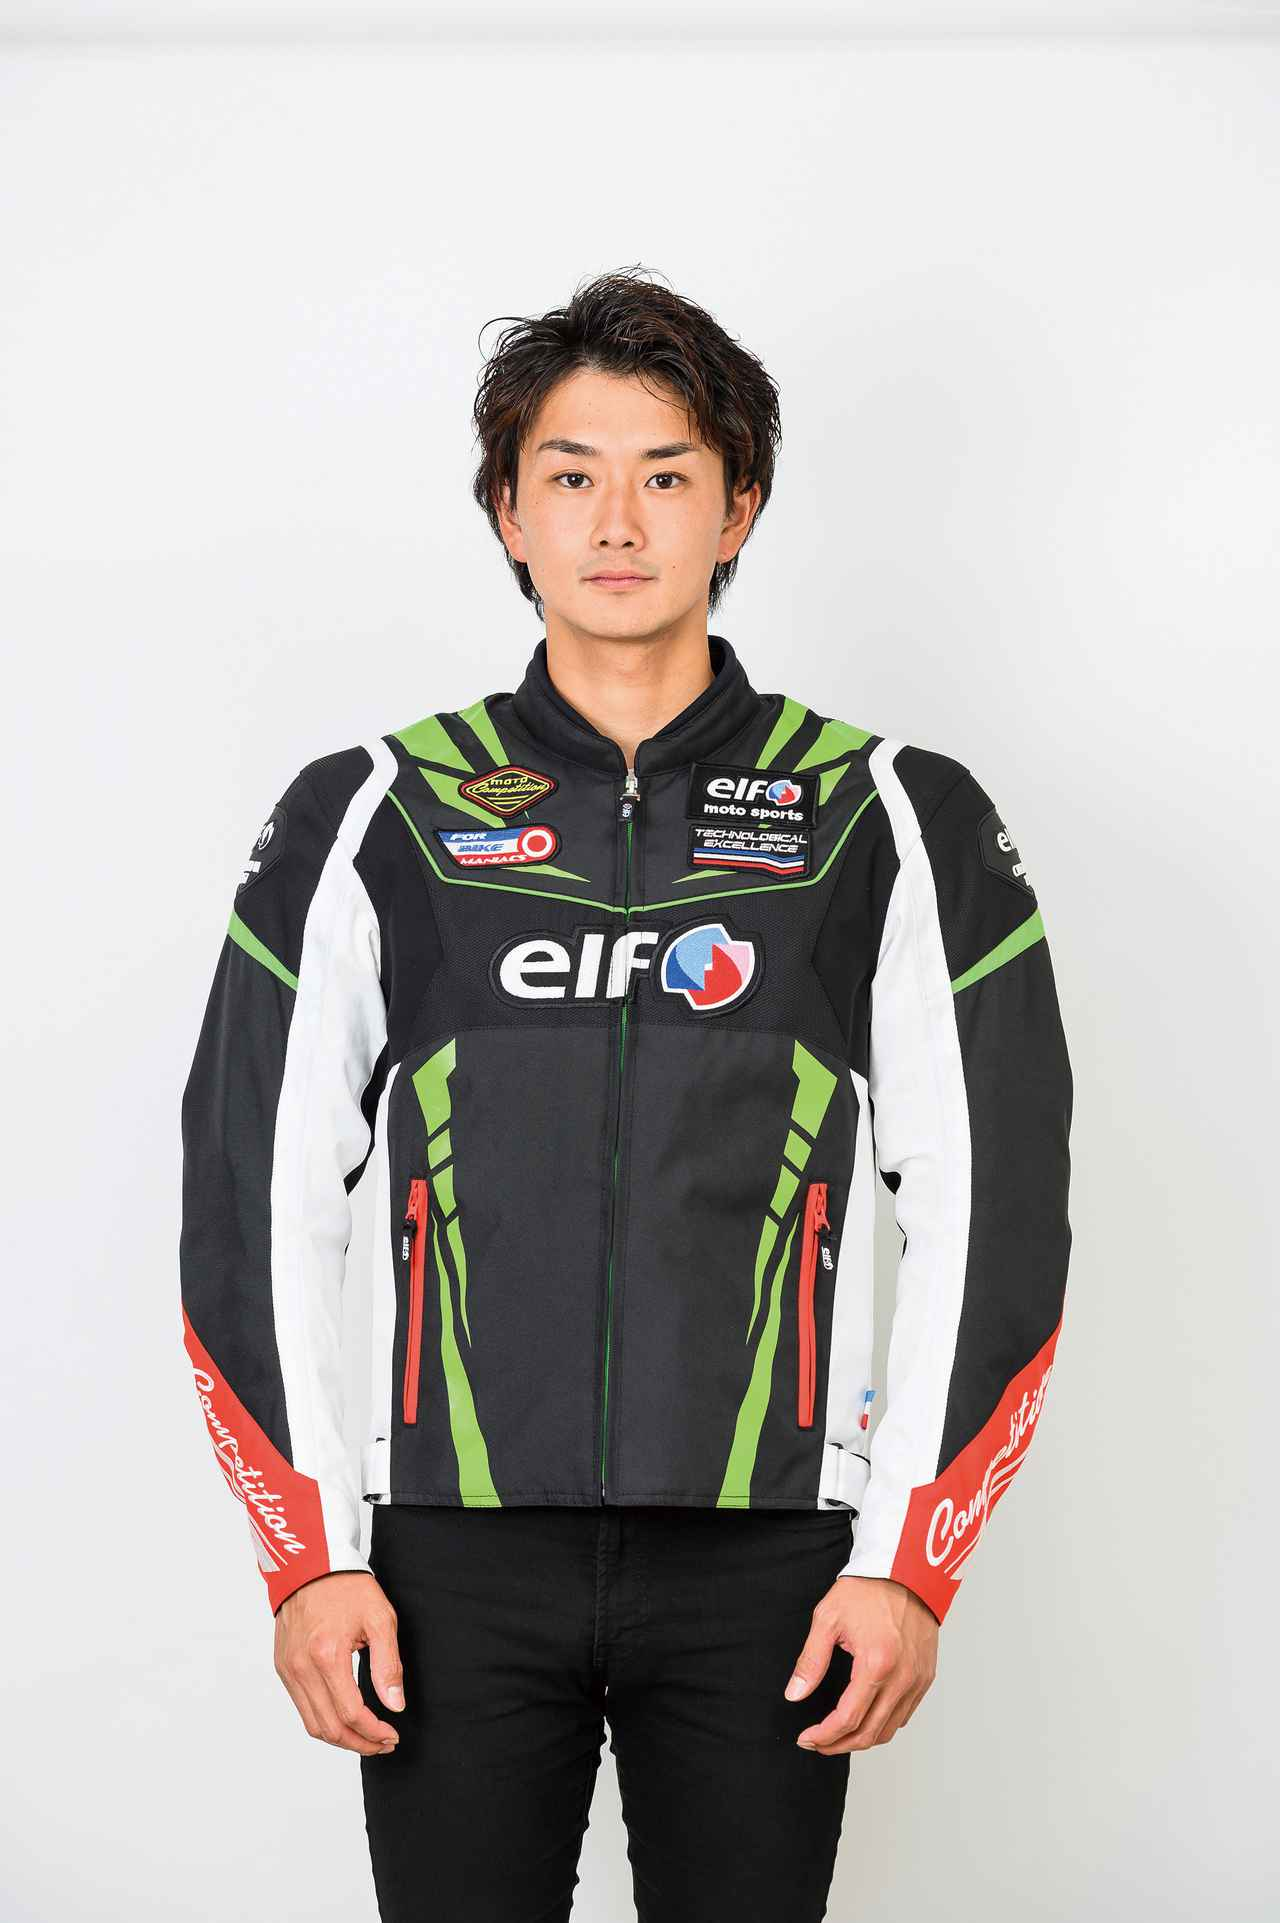 Images : 4番目の画像 - elf「EJ-W109 ヴィットリアスポルトジャケット」 - webオートバイ